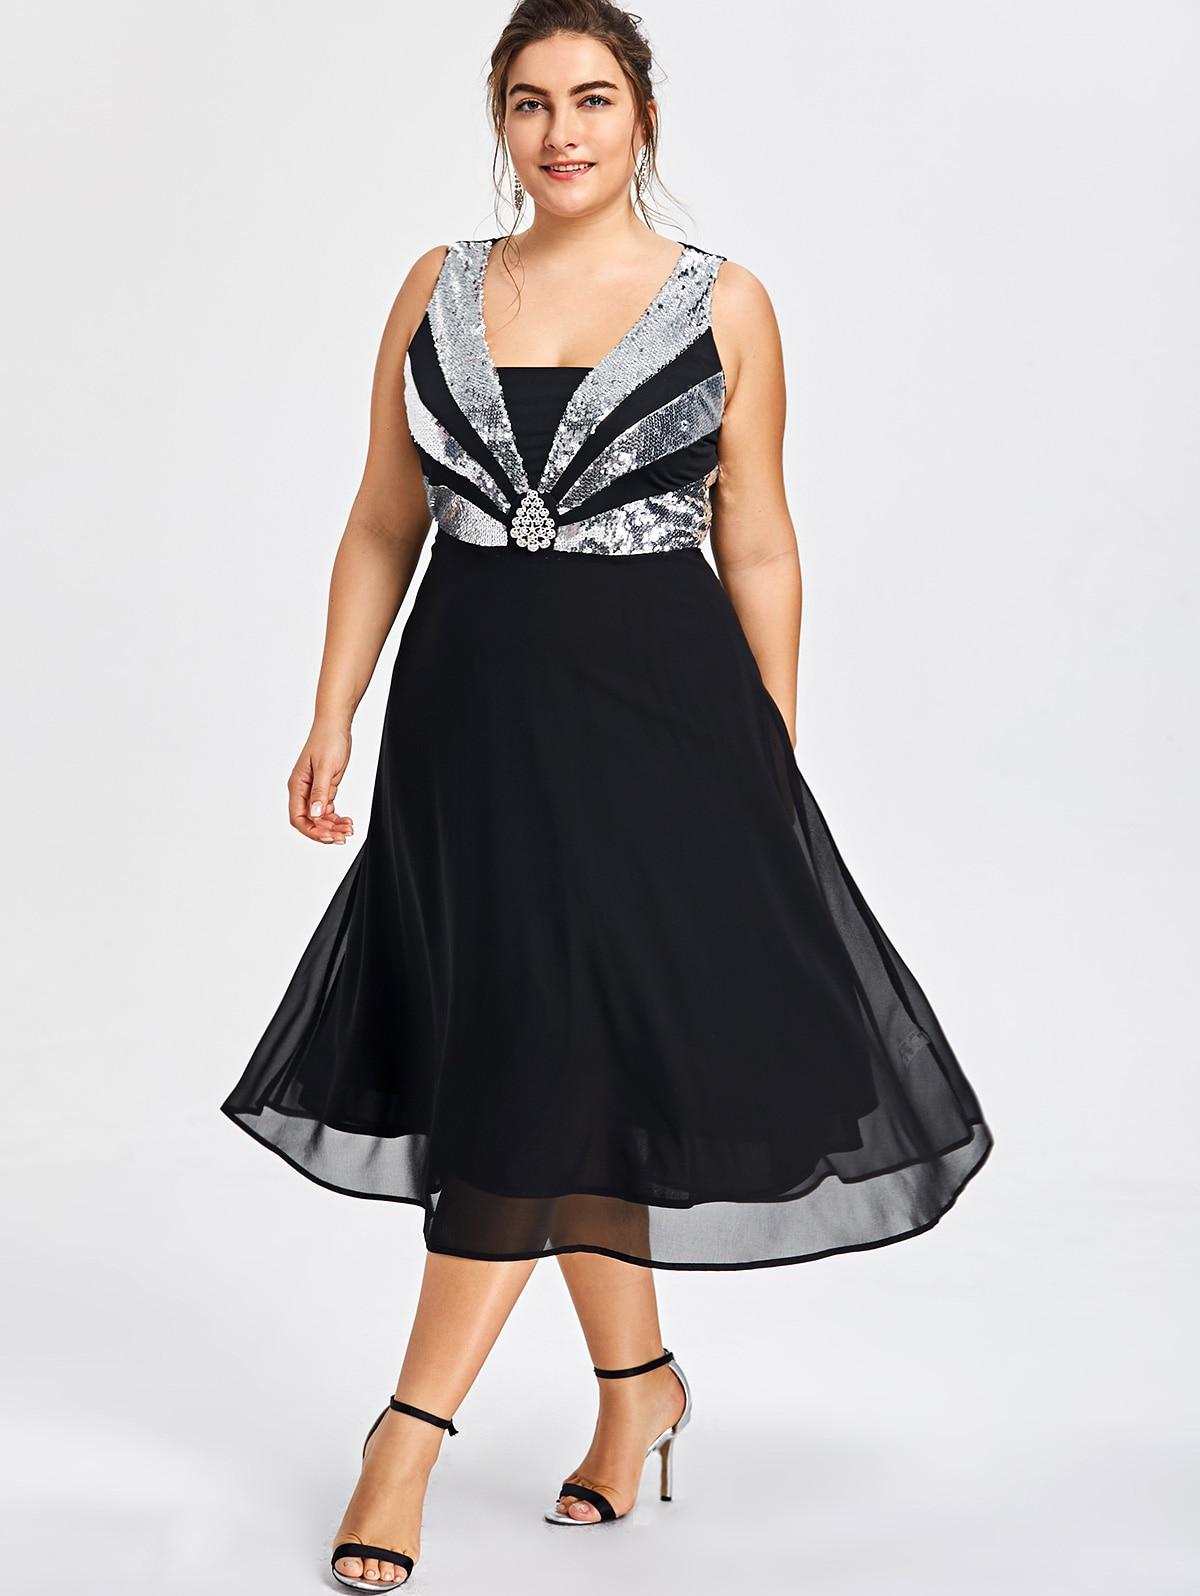 AZULINA Plus Größe Glittery Flowy Party Kleid Frauen Pailletten ...